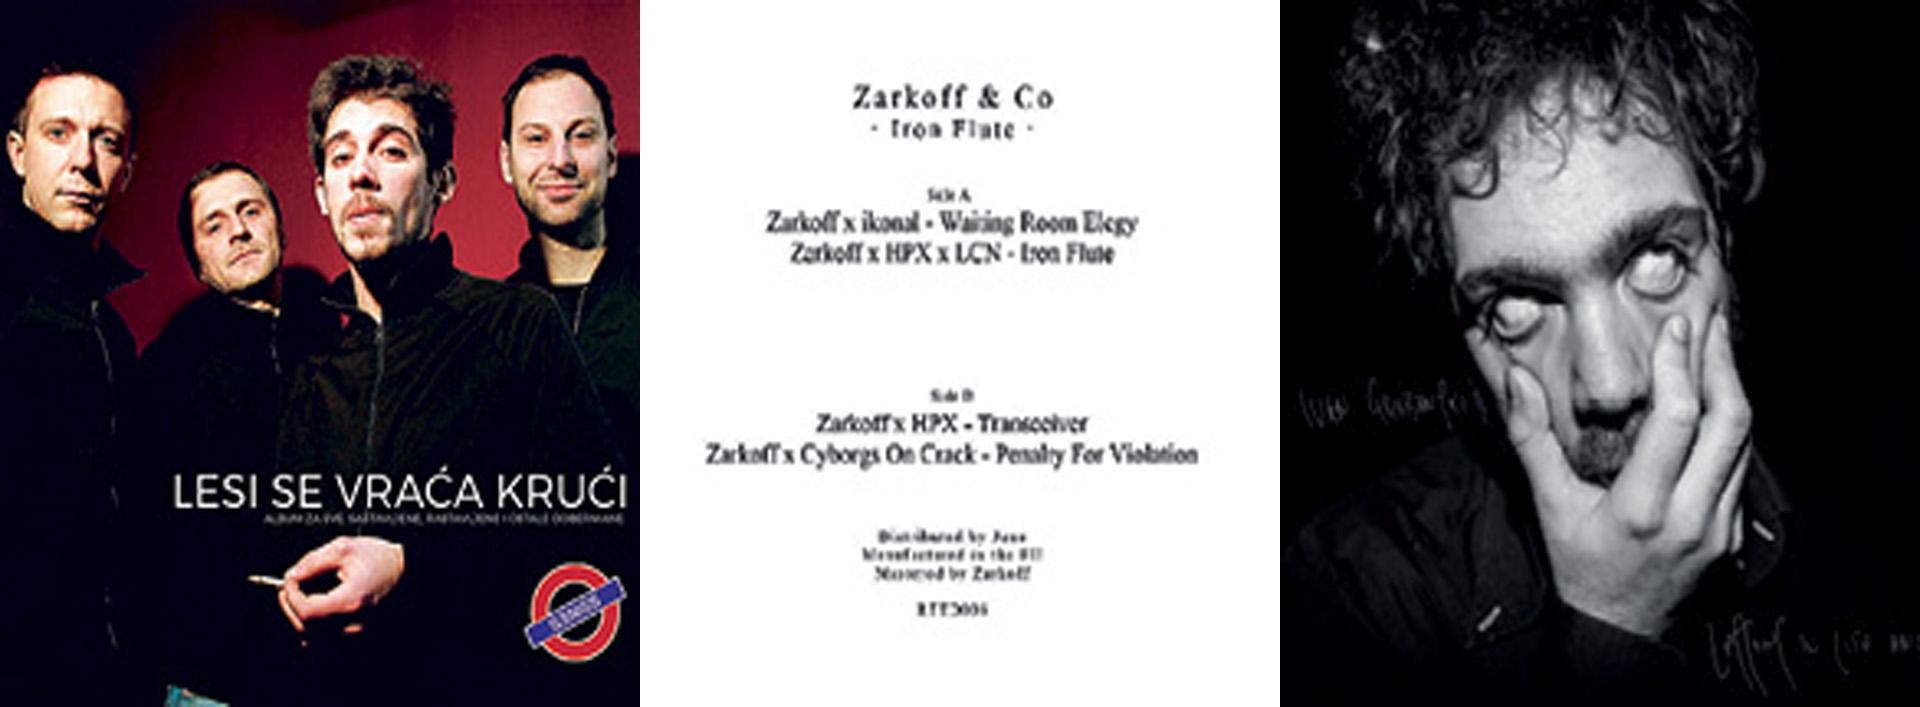 GLAZBENE RECENZIJE S3ngs, Zarkoff, Ivan Grobenski